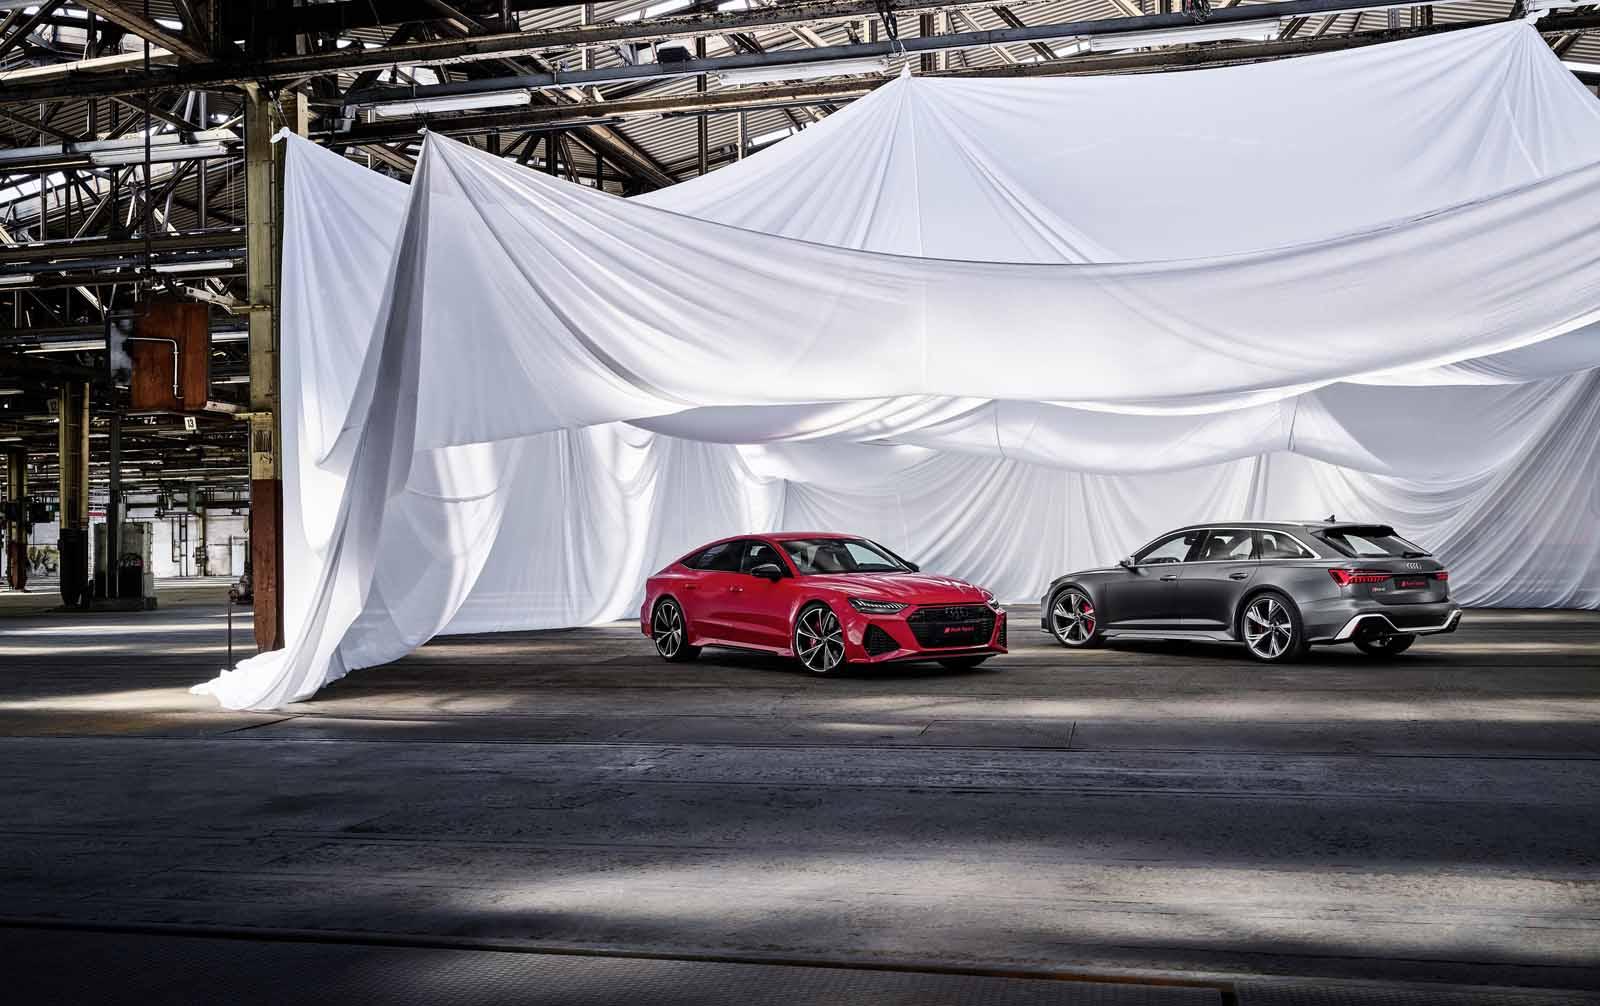 Audi RS 7 Sportback, Audi RS 6 Avant